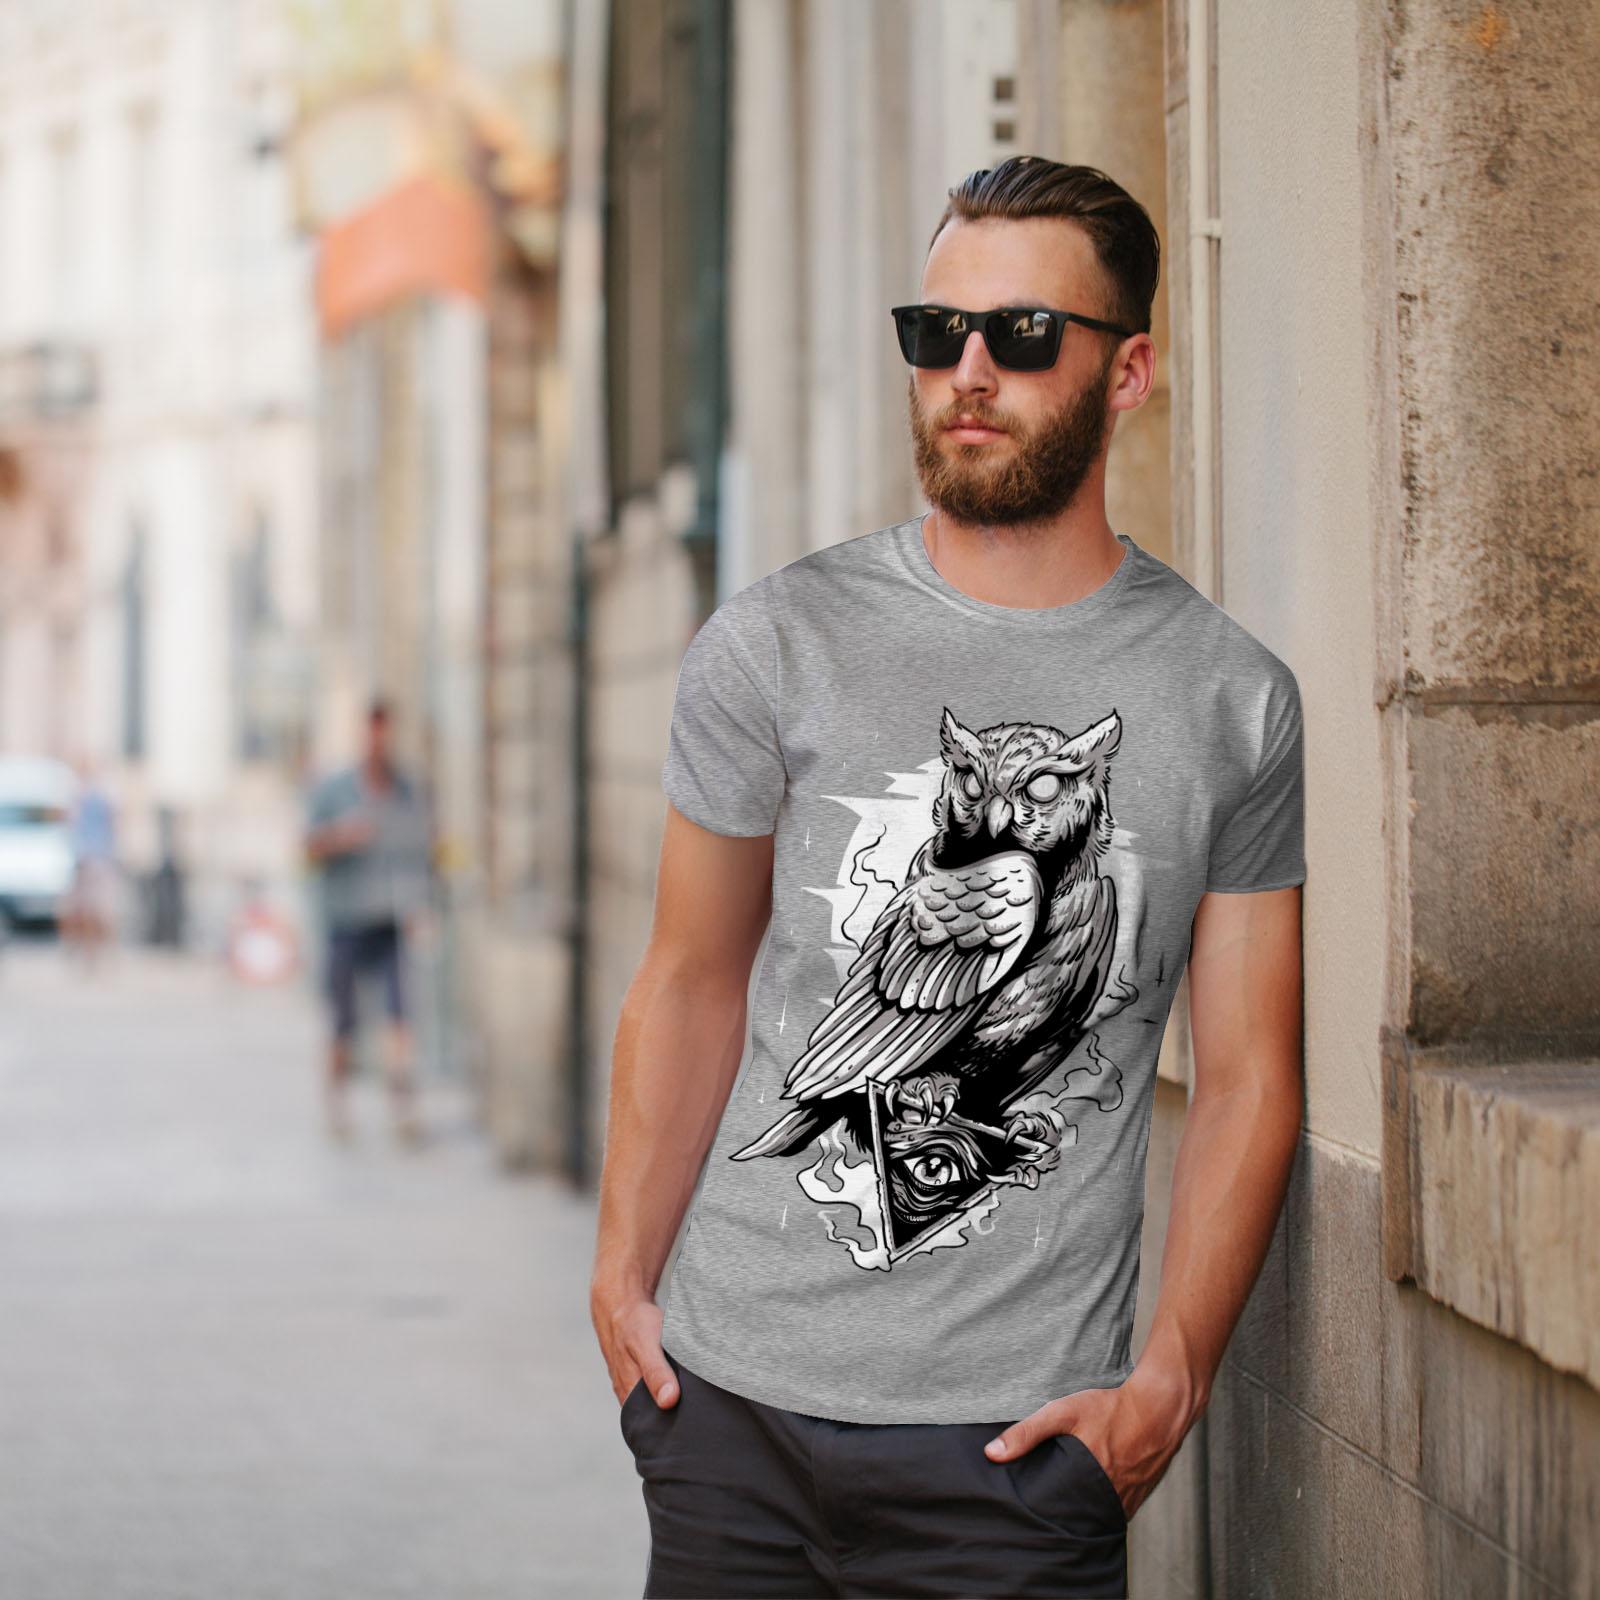 miniature 17 - Wellcoda Triangle Owl Mens T-shirt, Conspiracy Graphic Design Printed Tee